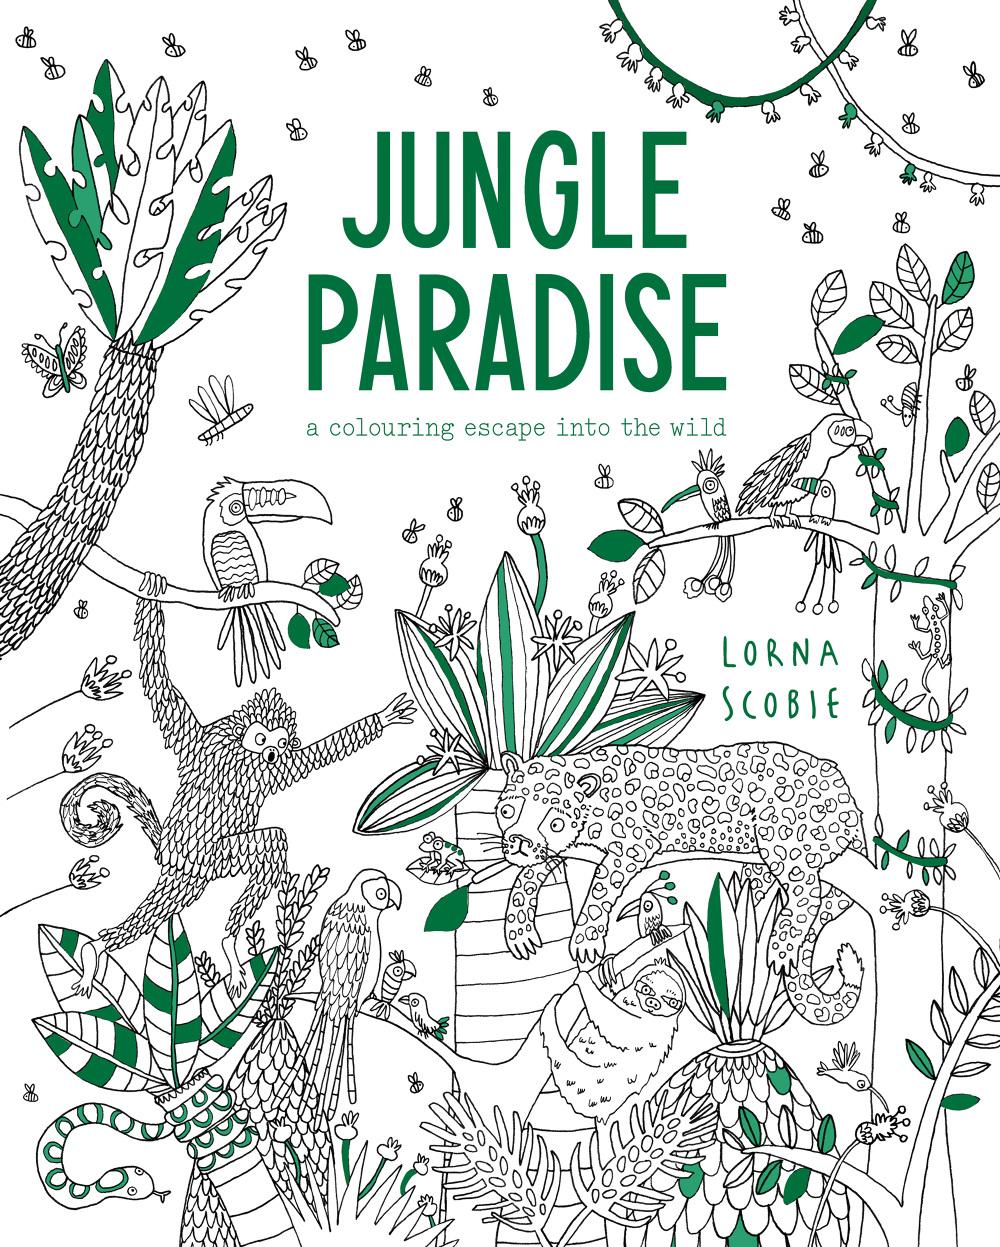 Jungle Paradise colouring book - Lorna Scobie Illustration